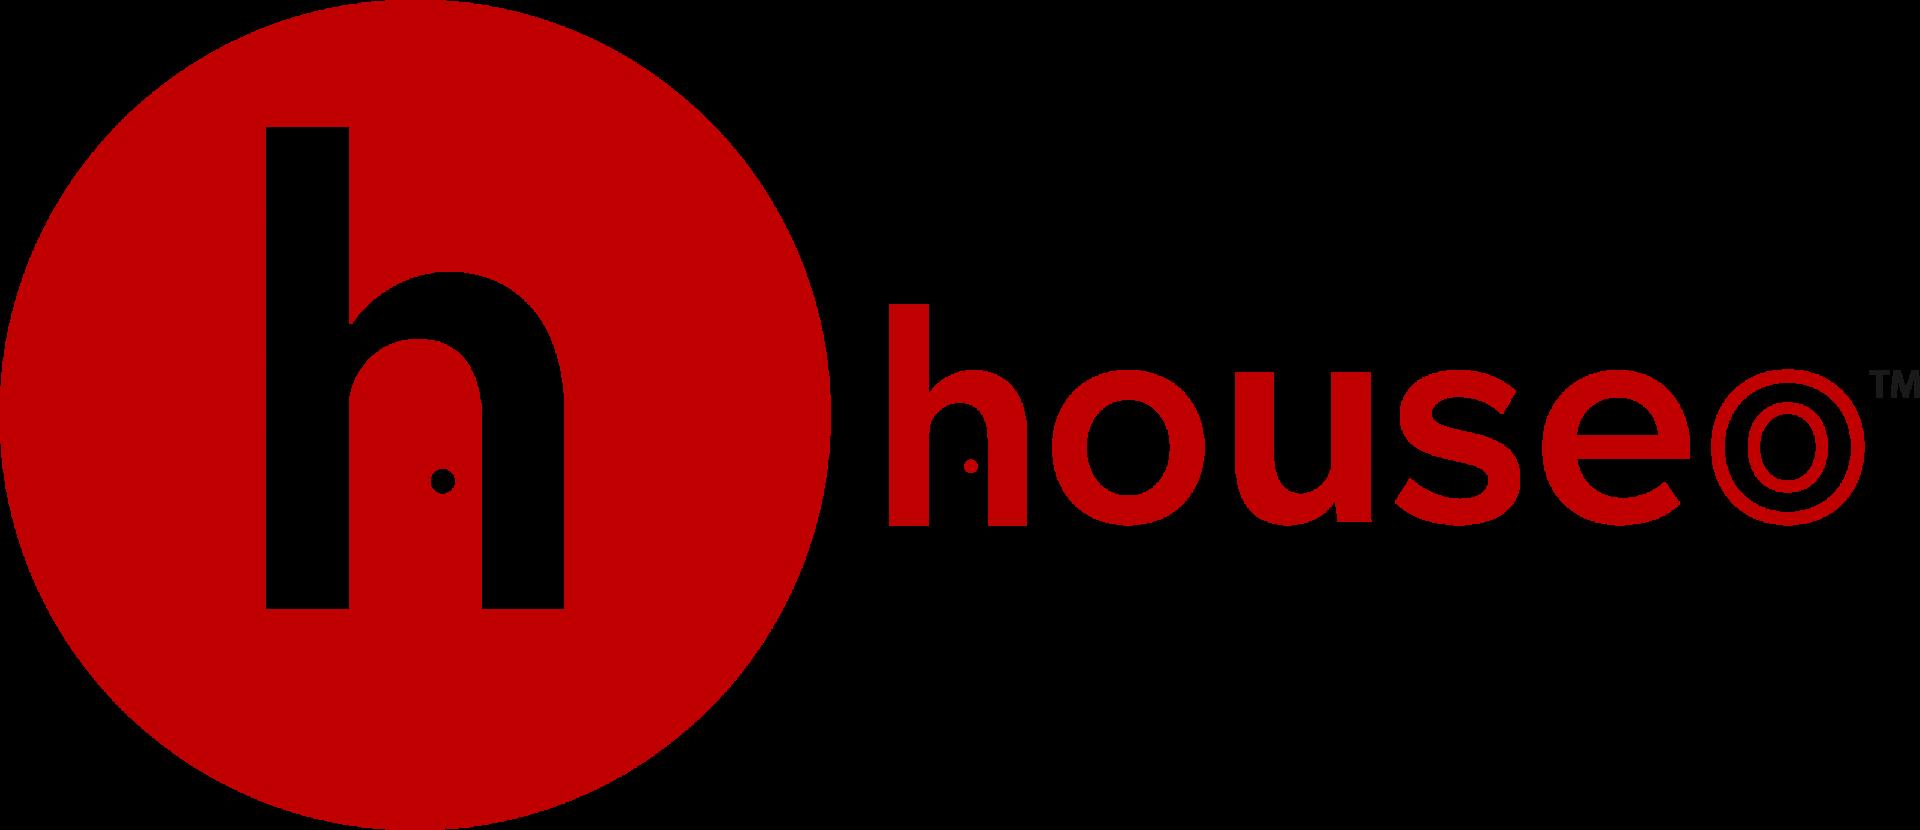 Houseo logo